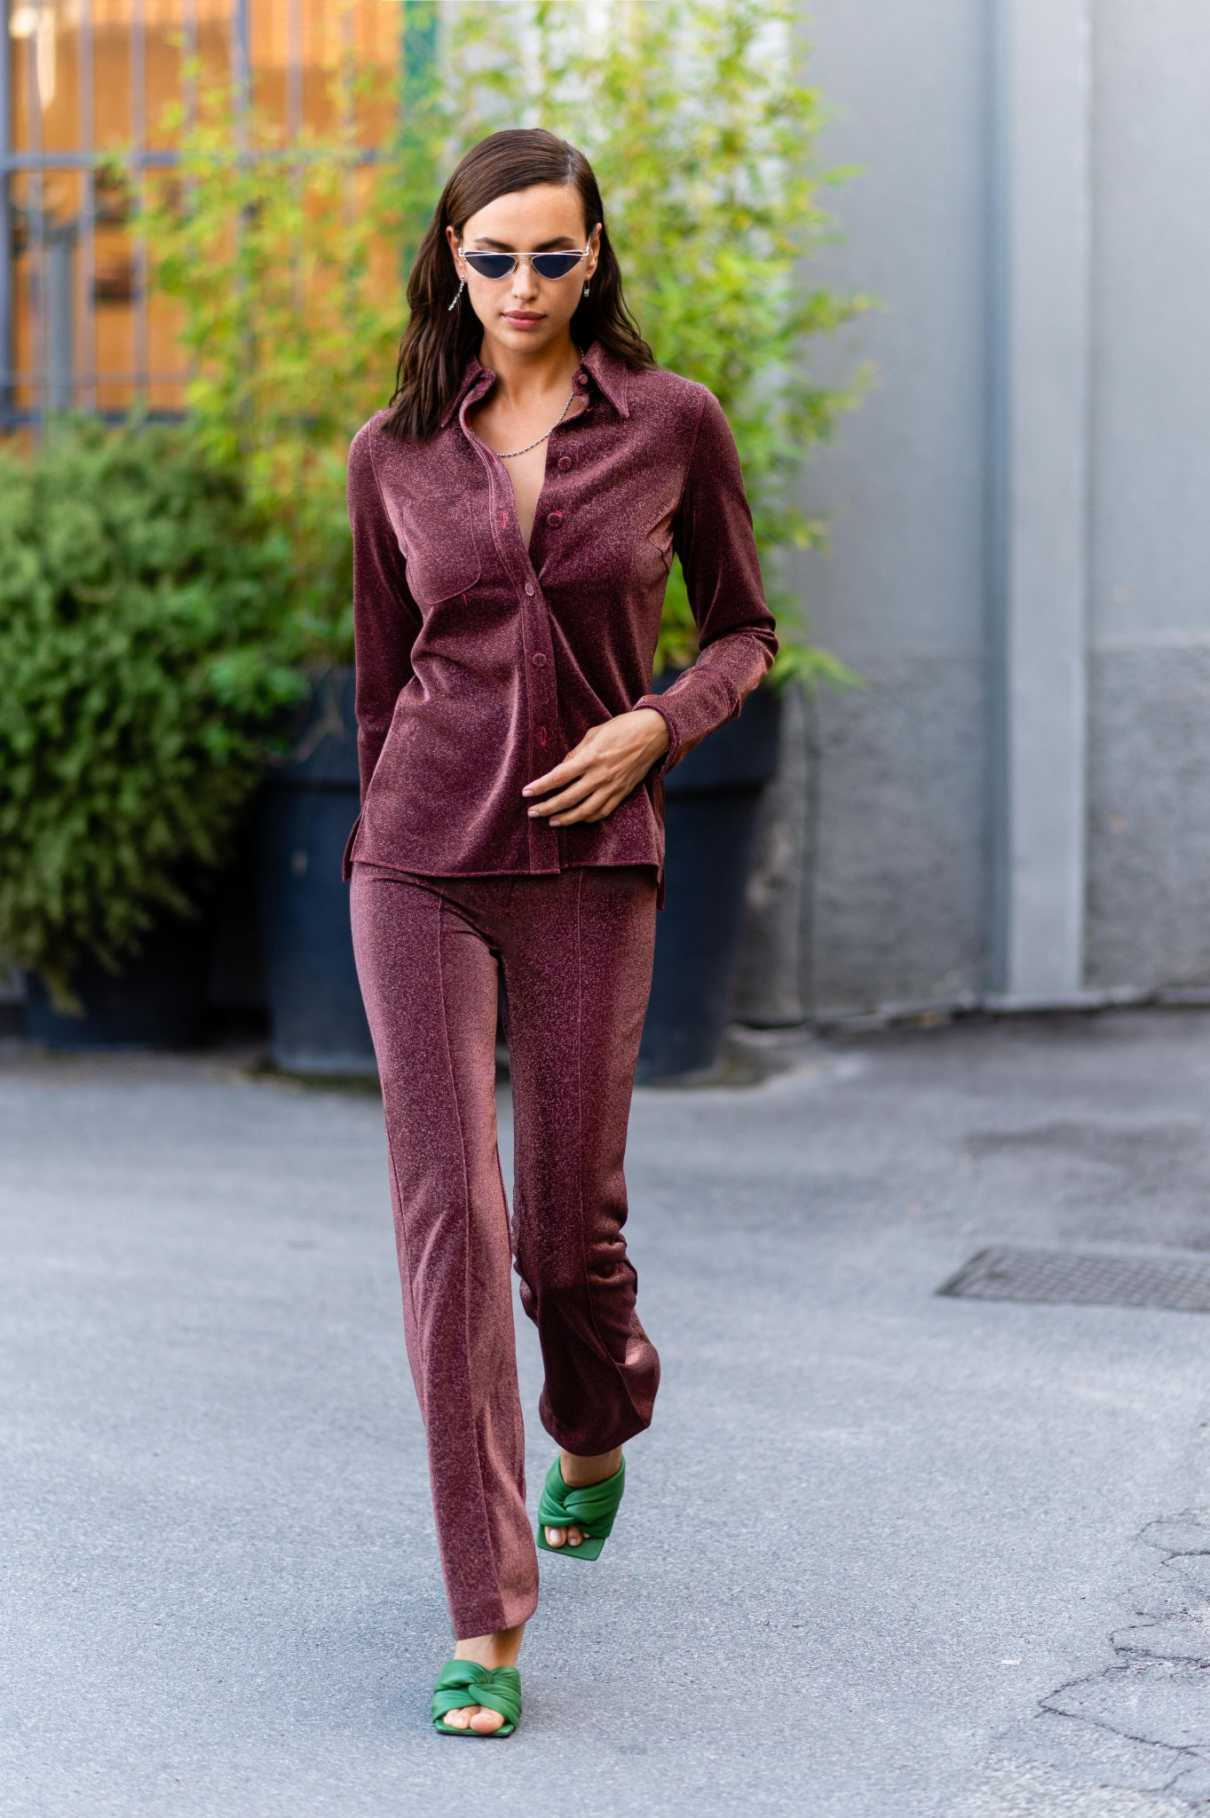 Irina Shayk in a Green Flip-Flops